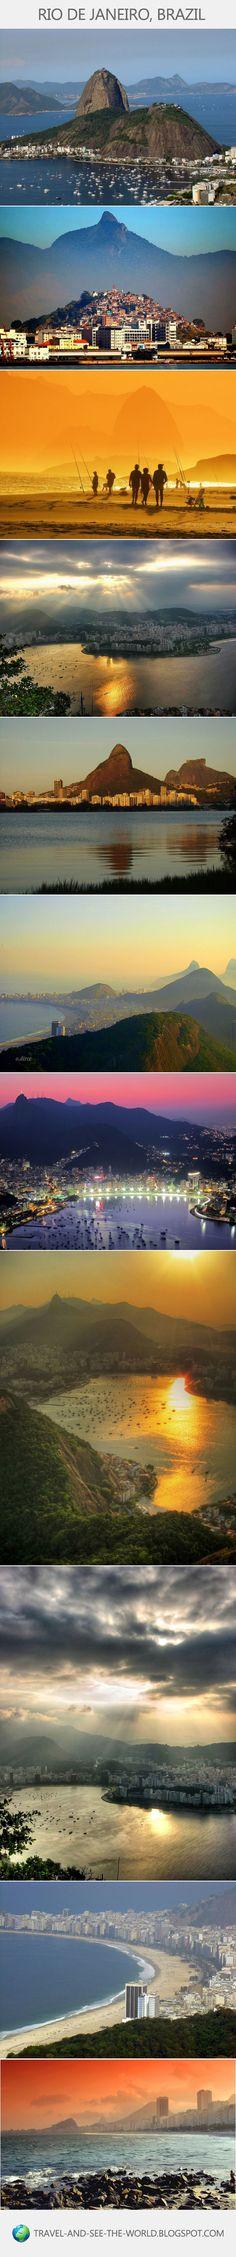 Travel and see the world: Rio de Janeiro, Brazil